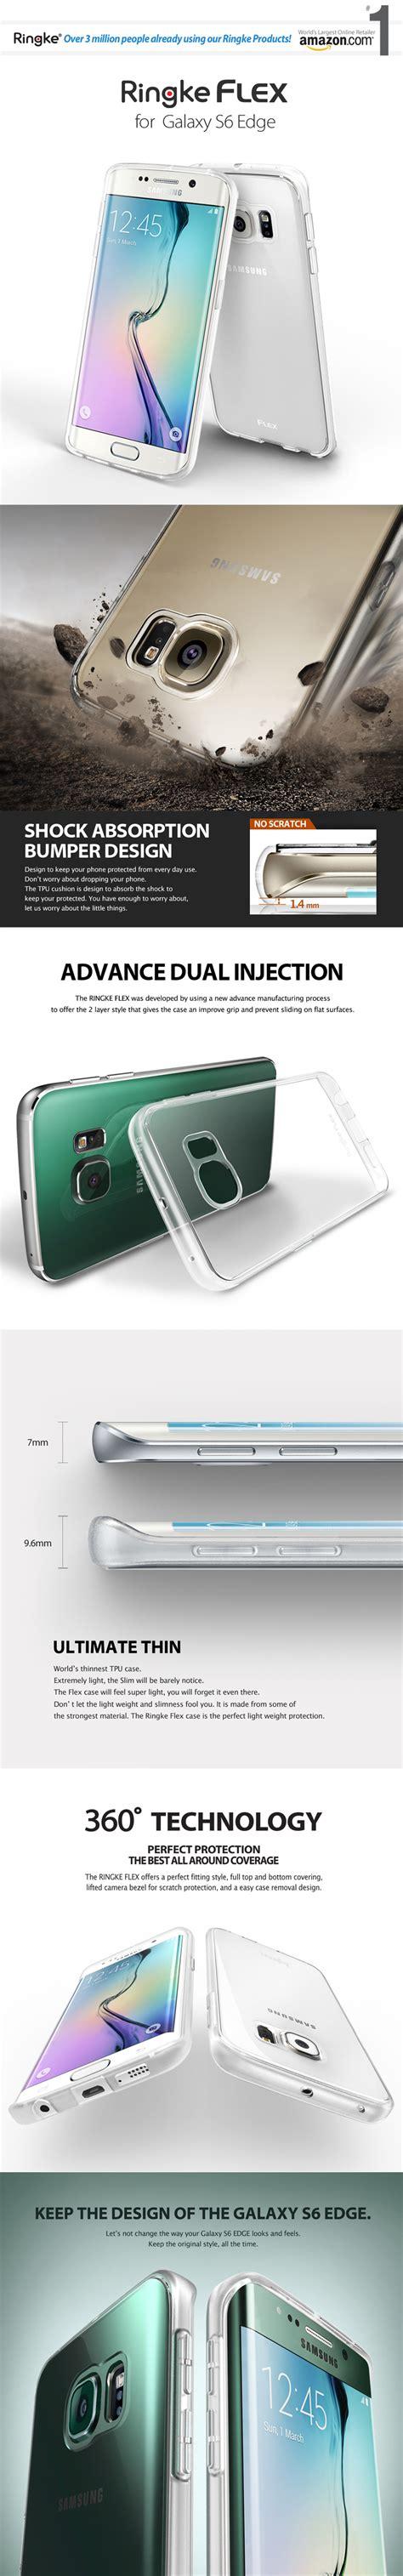 Rearth Ringke Flex Samsung Galaxy S6 Edge Original View sales ori rearth usa ringke flex sam end 4 27 2019 1 33 pm